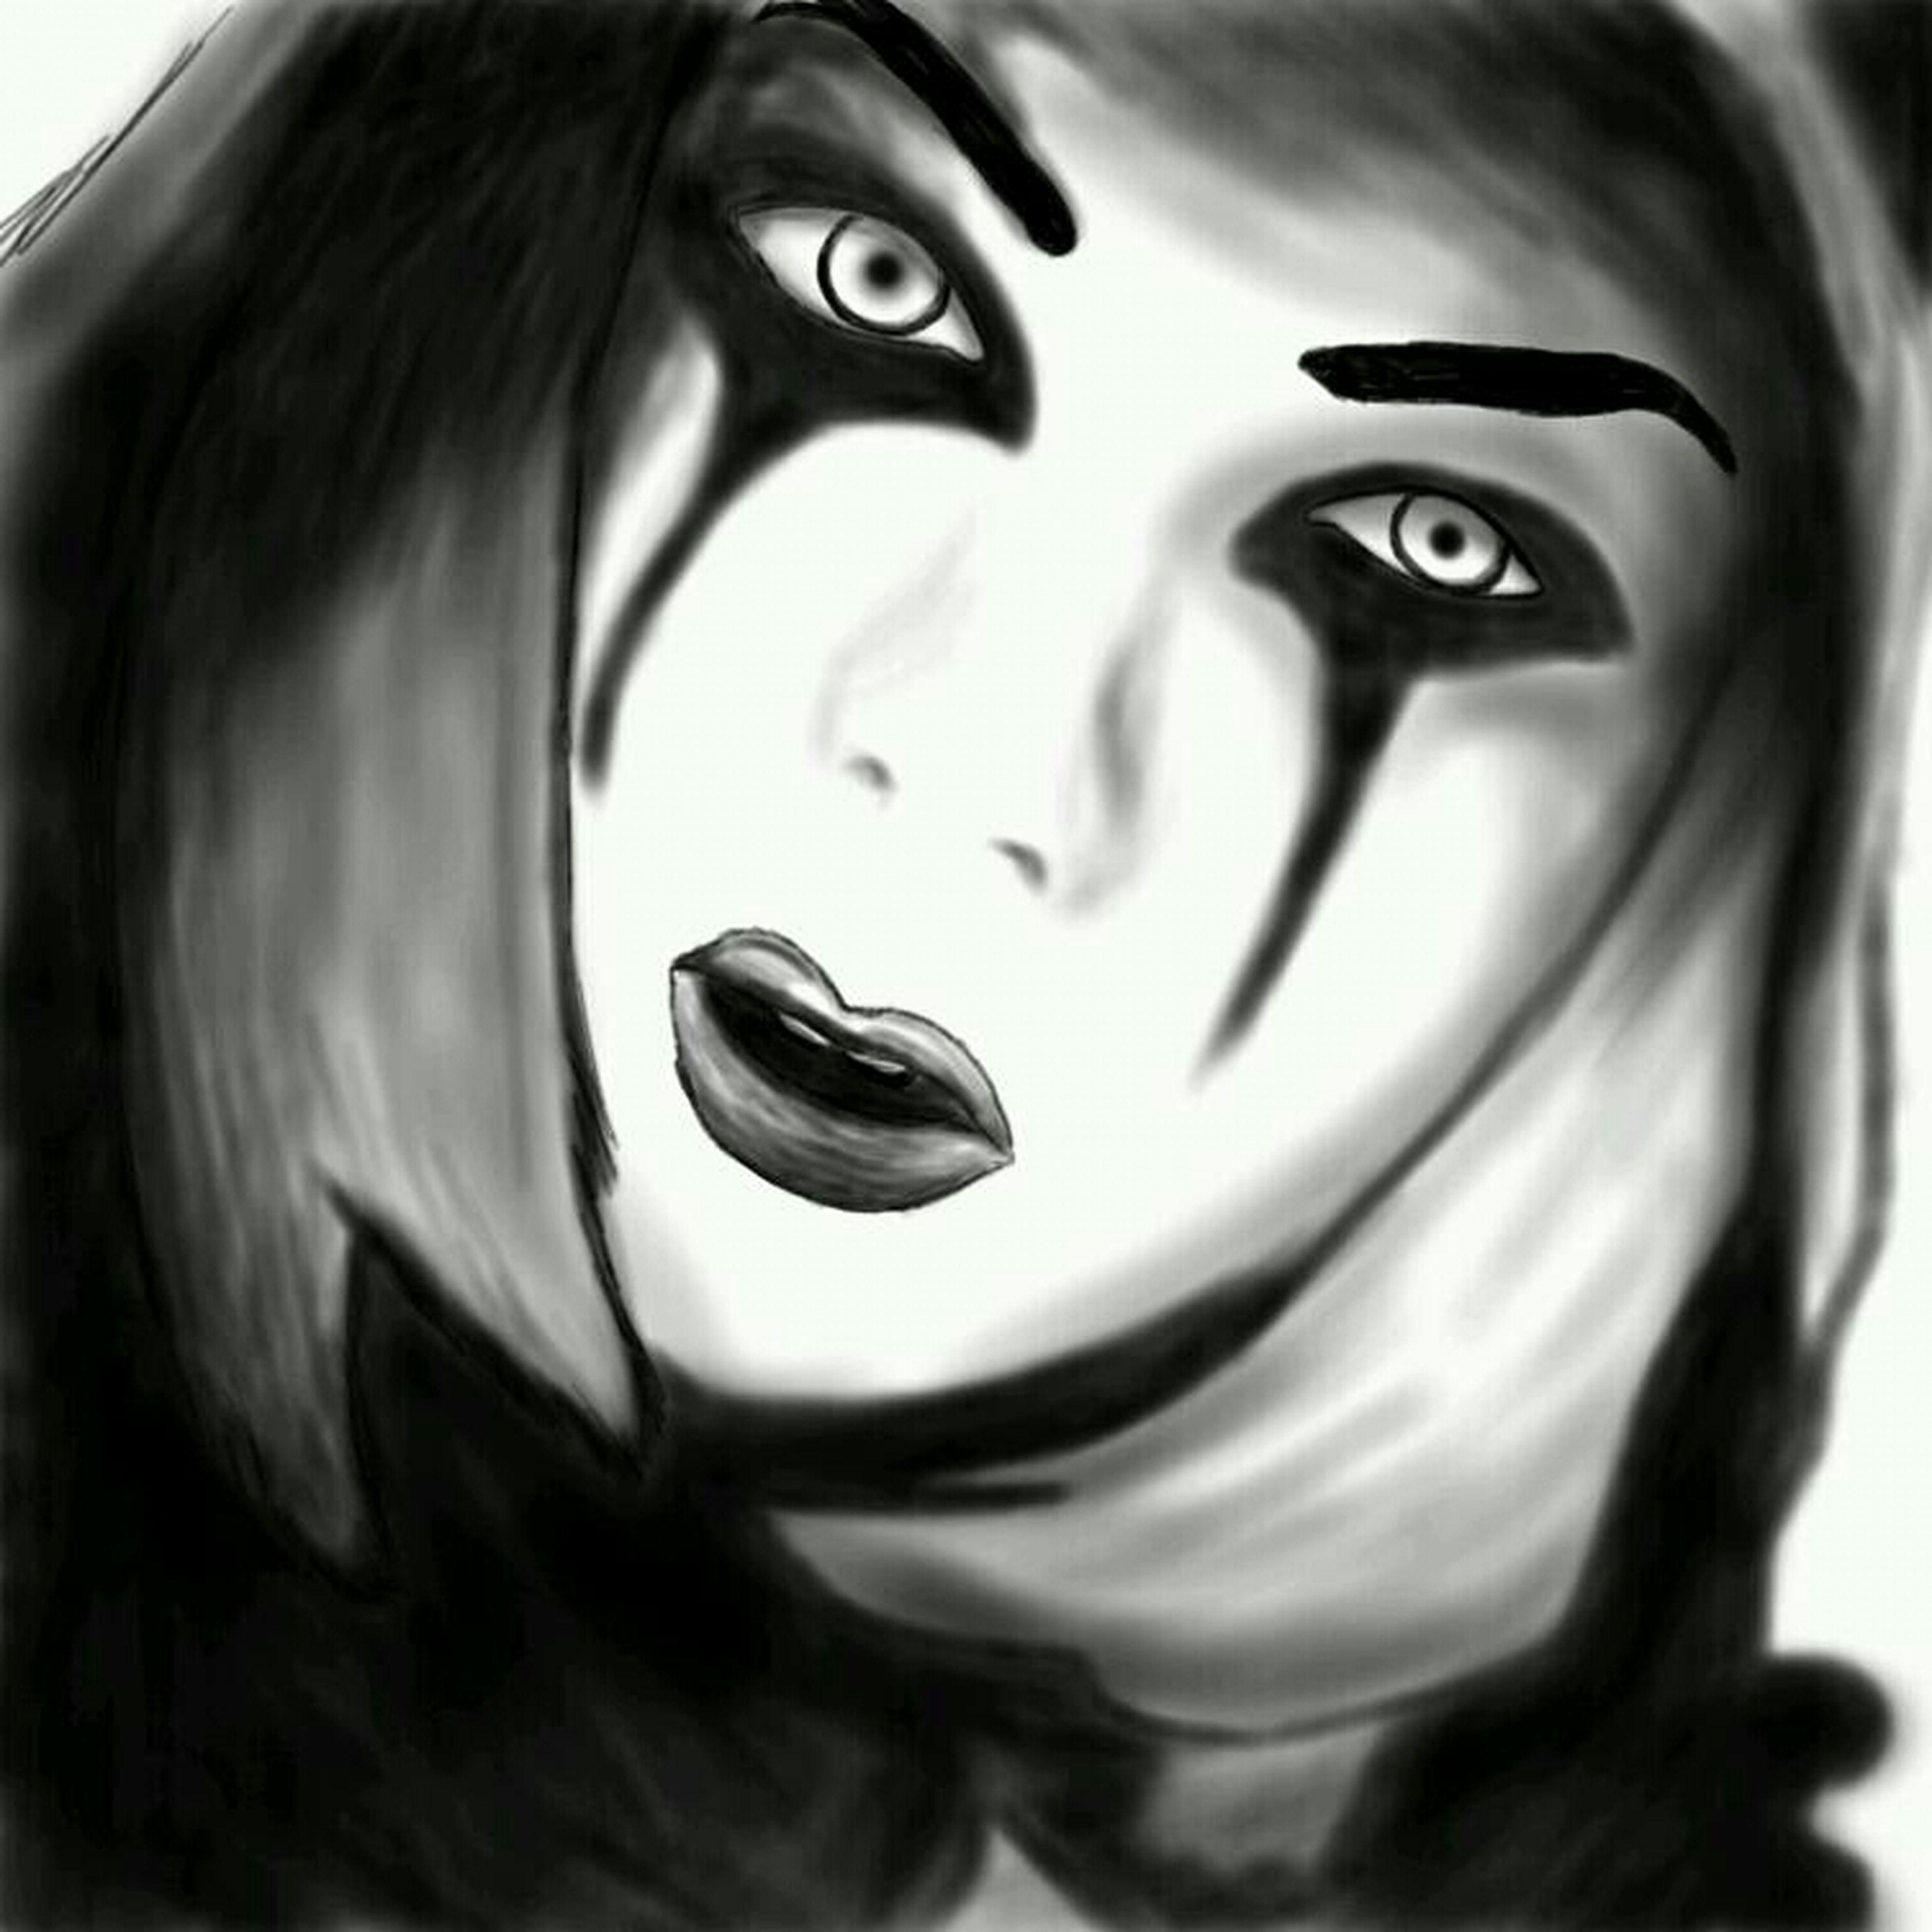 Digital Art I Drew This!